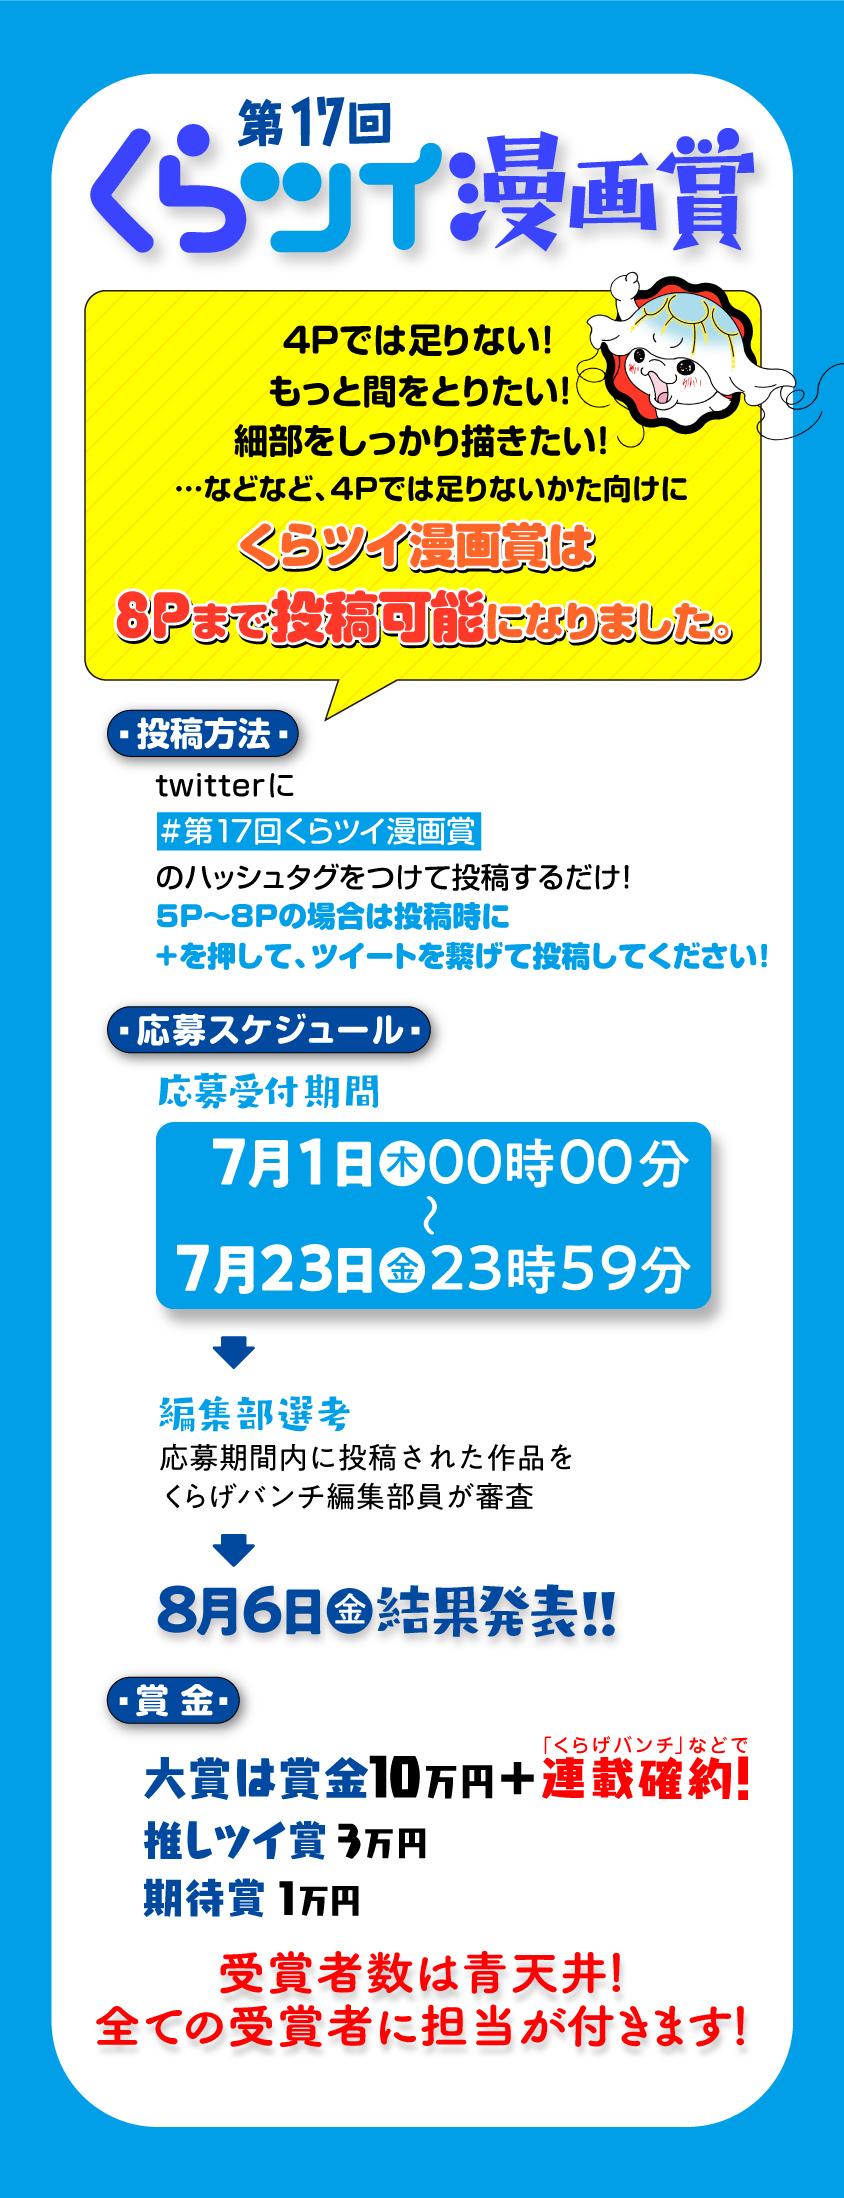 f:id:kuragebunch:20210528042800j:plain